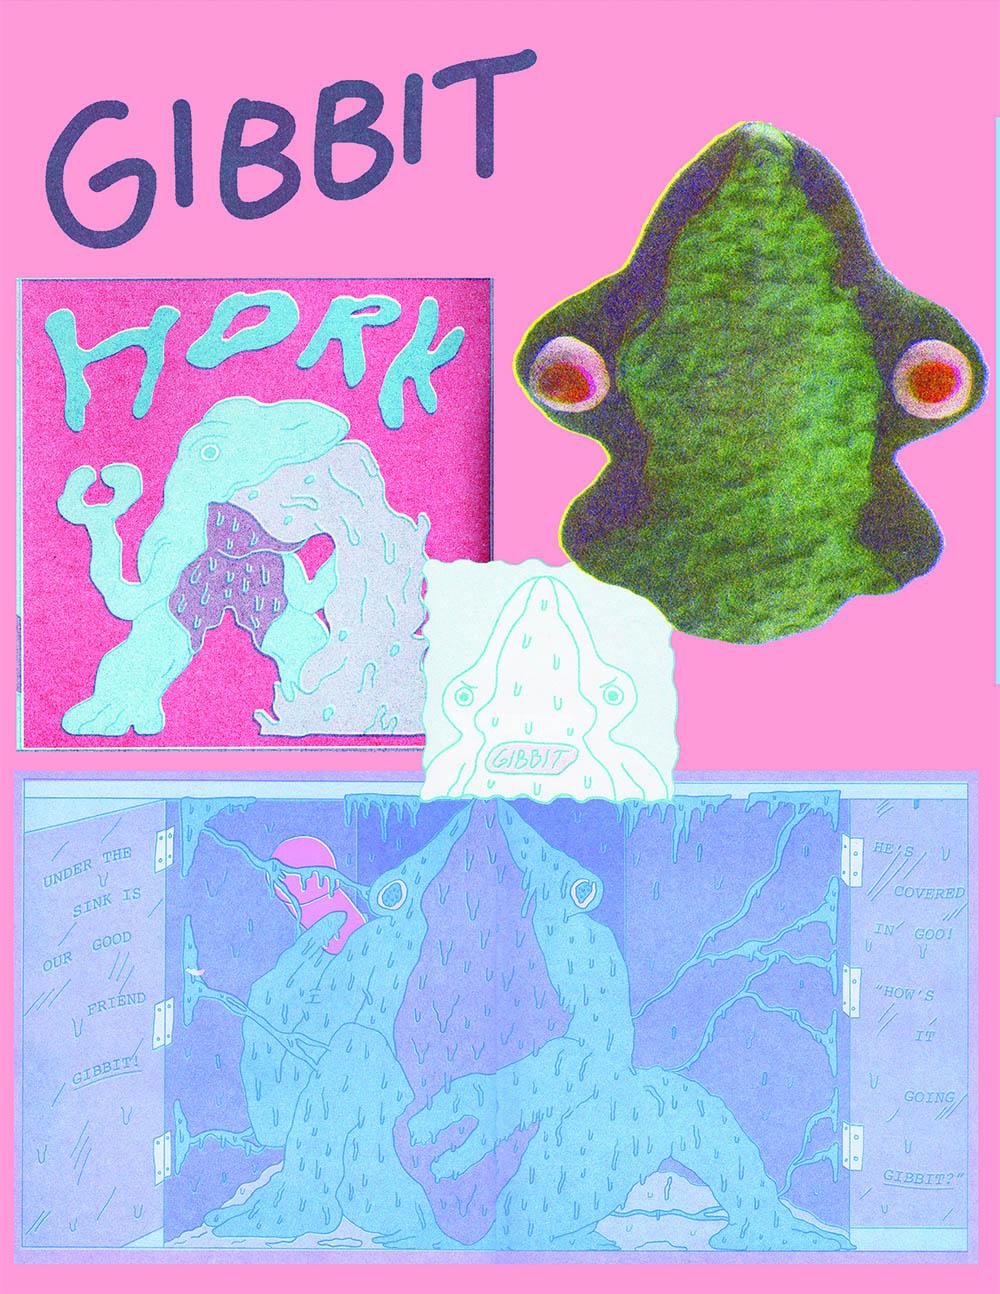 CC CH pdf_0003s_0001_gibbit.jpg